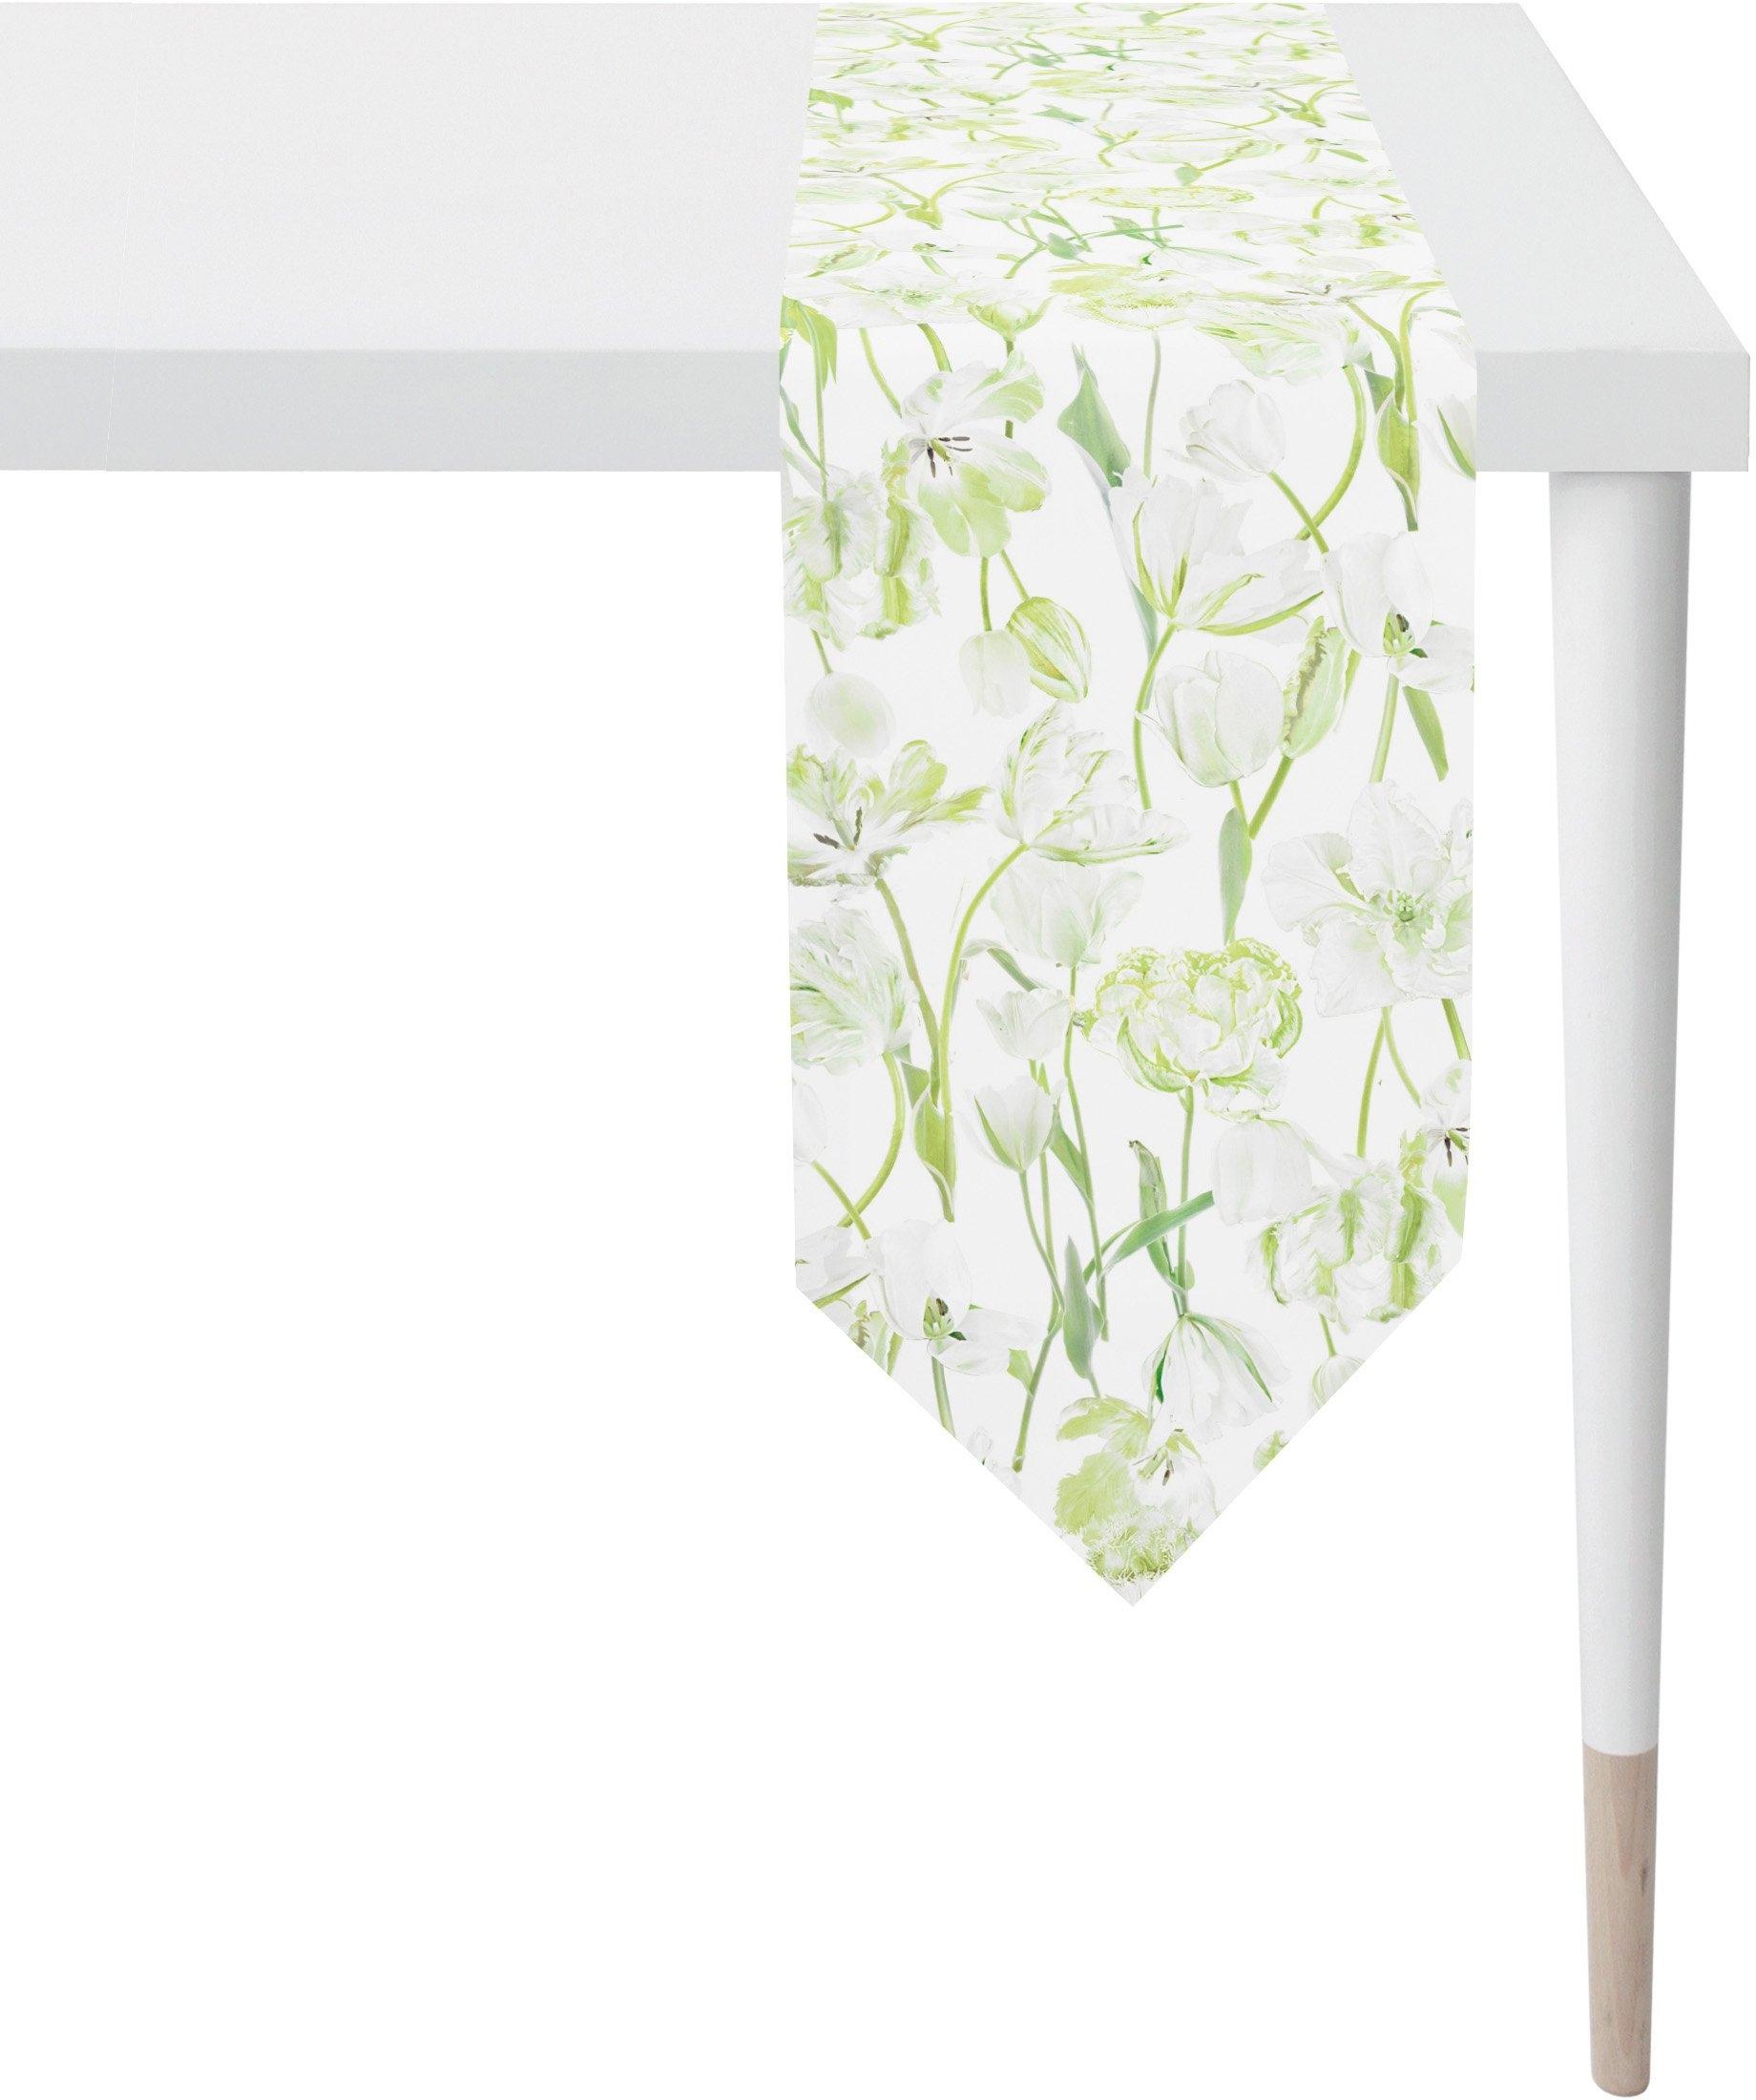 APELT tafelband 6449 SPRINGTIME digitale print (1 stuk) nu online kopen bij OTTO